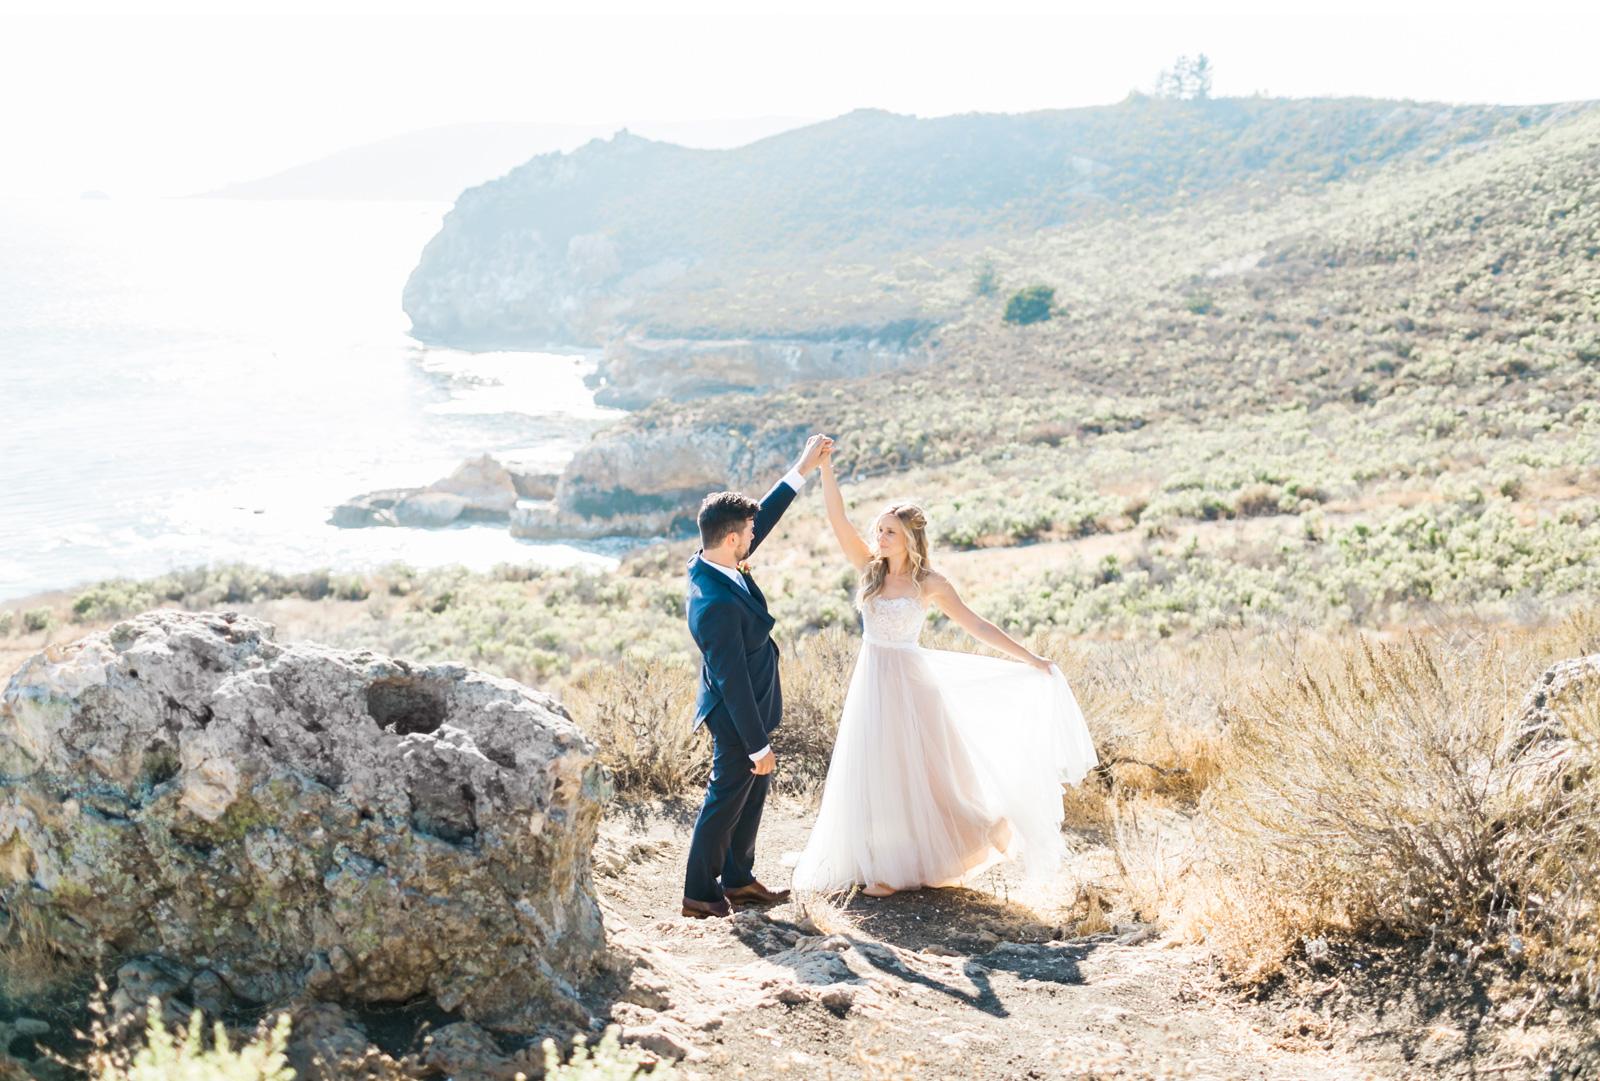 Style-Me-Pretty-San-Luis-Obispo-Wedding-Natalie-Schutt-Photography_03.jpg